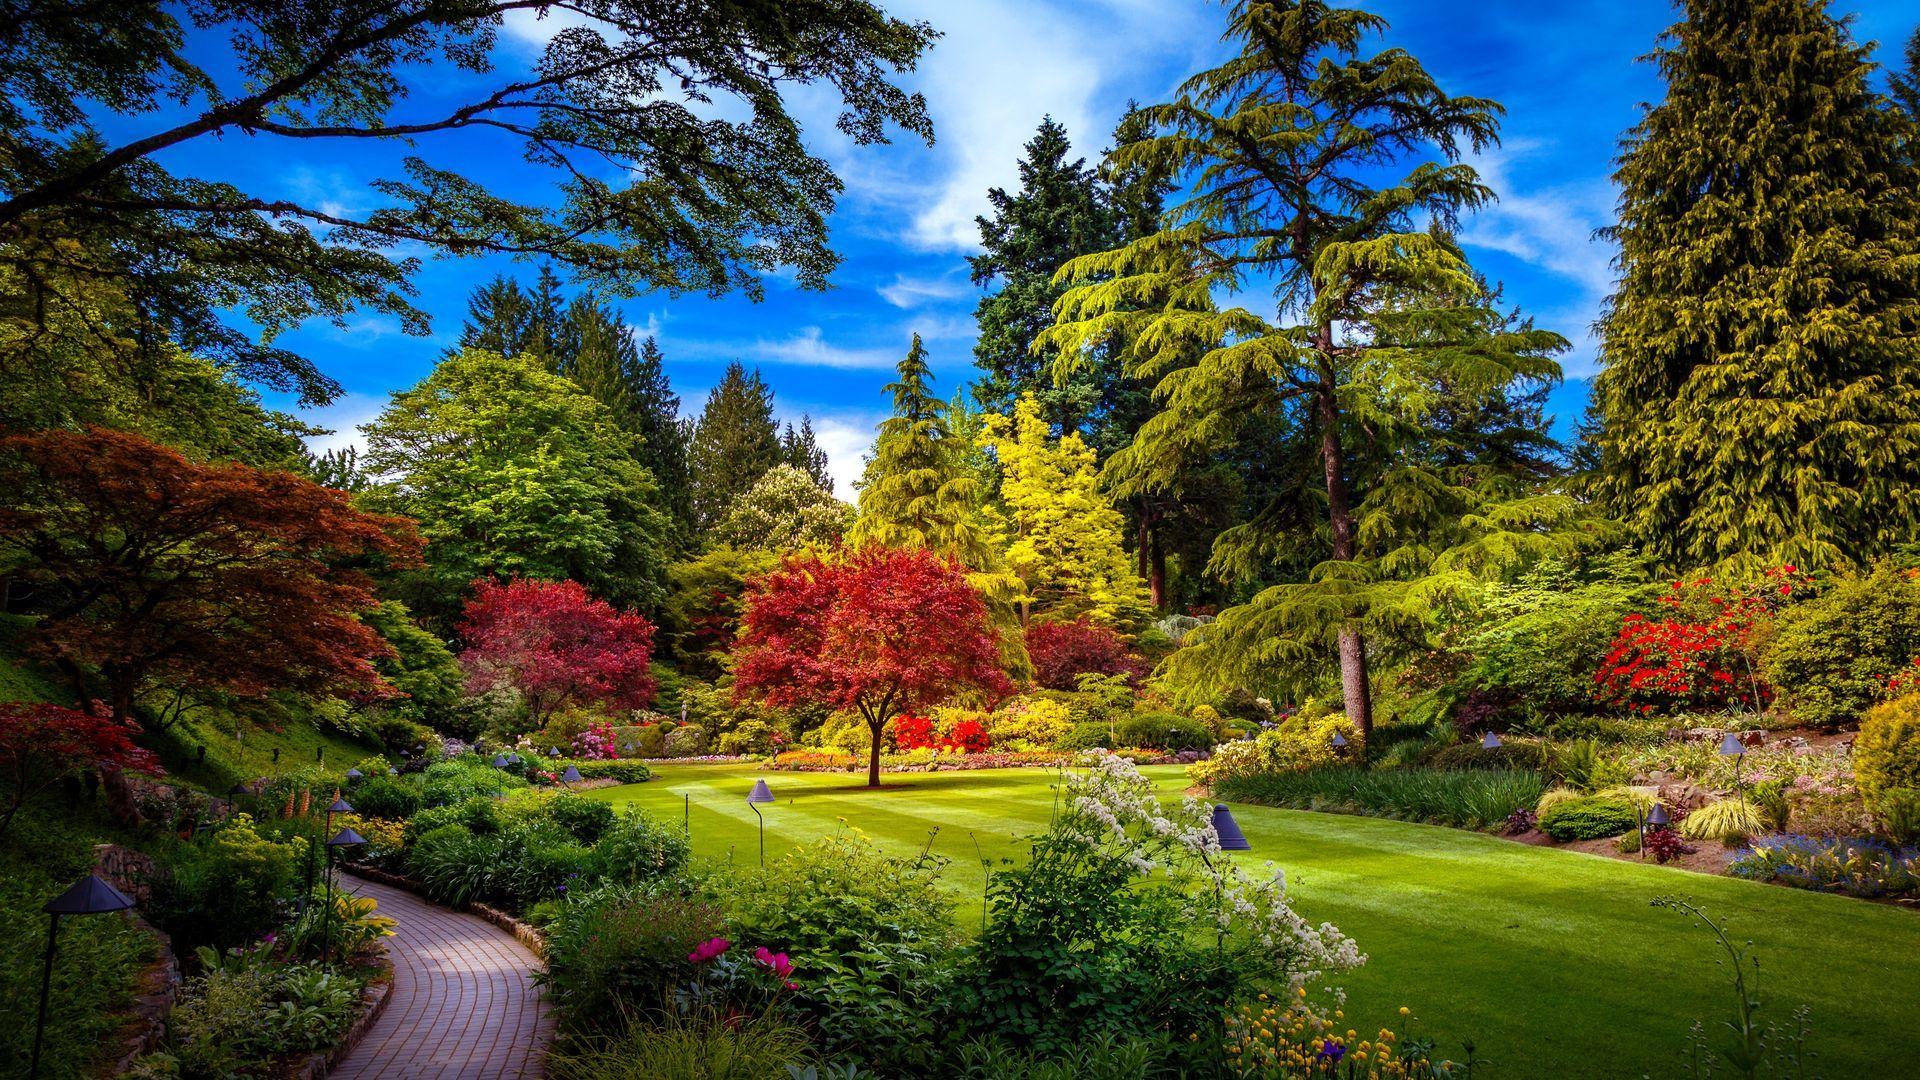 Colorful Park Spring Nature Hd Wallpaper Butchart Gardens Garden Visits Amazing Gardens